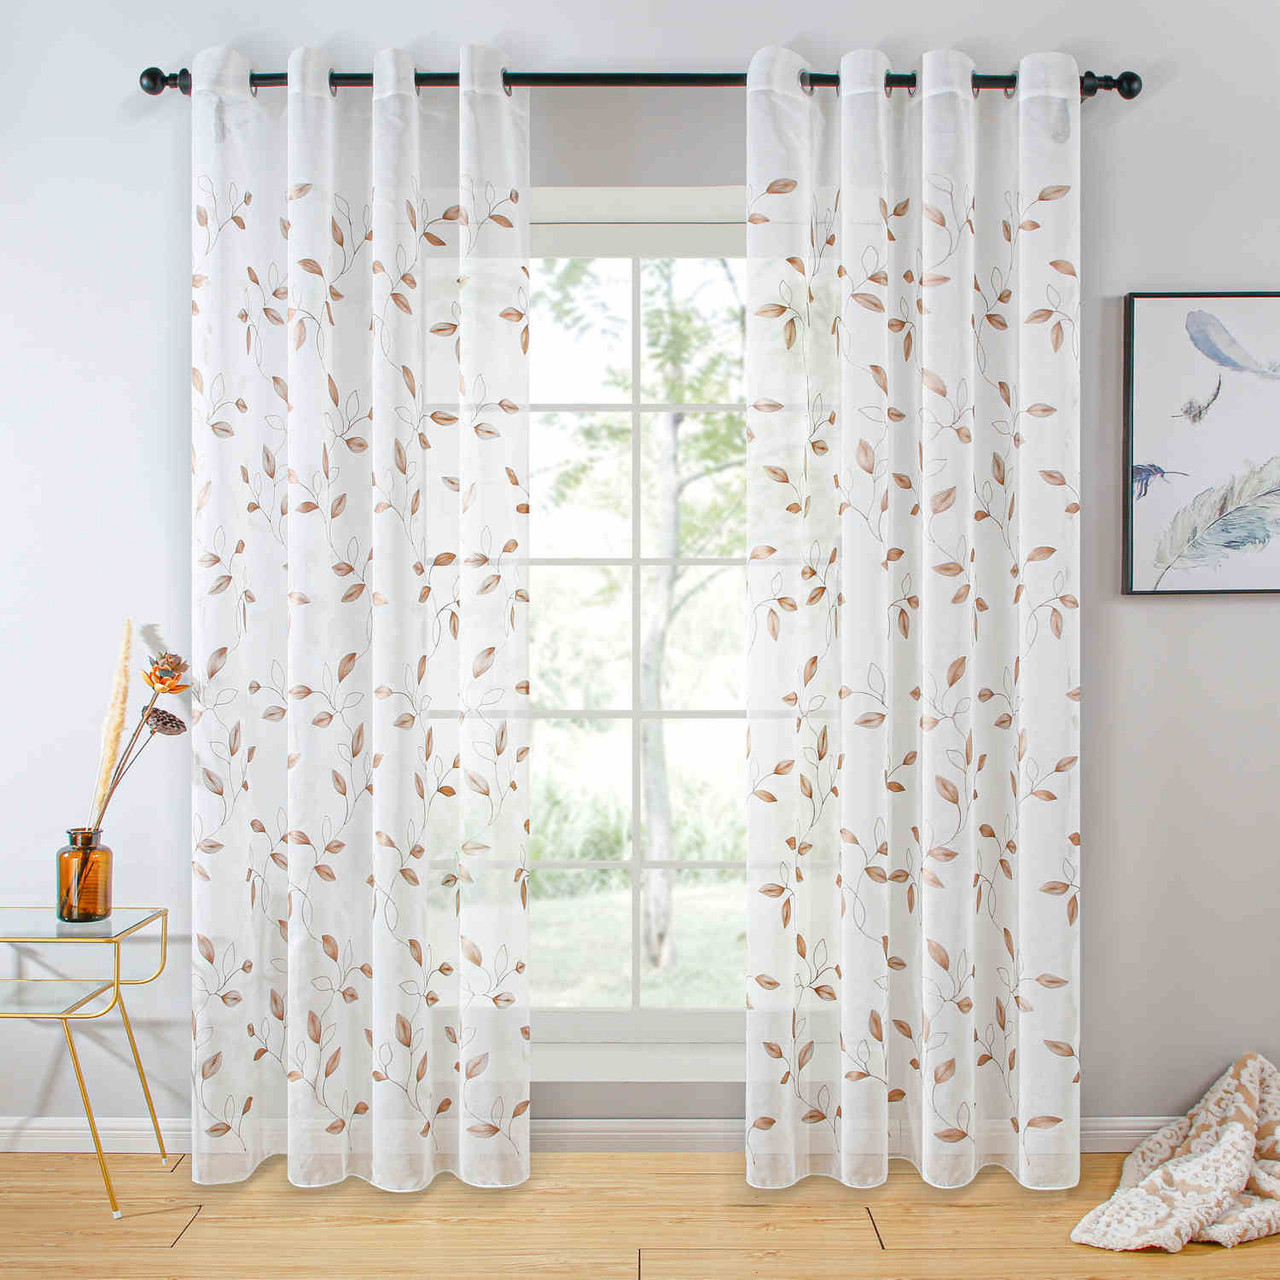 Sheer Curtain Panel Grommet-Top Window Treatments DMC729 Dolce Mela 8171460152140